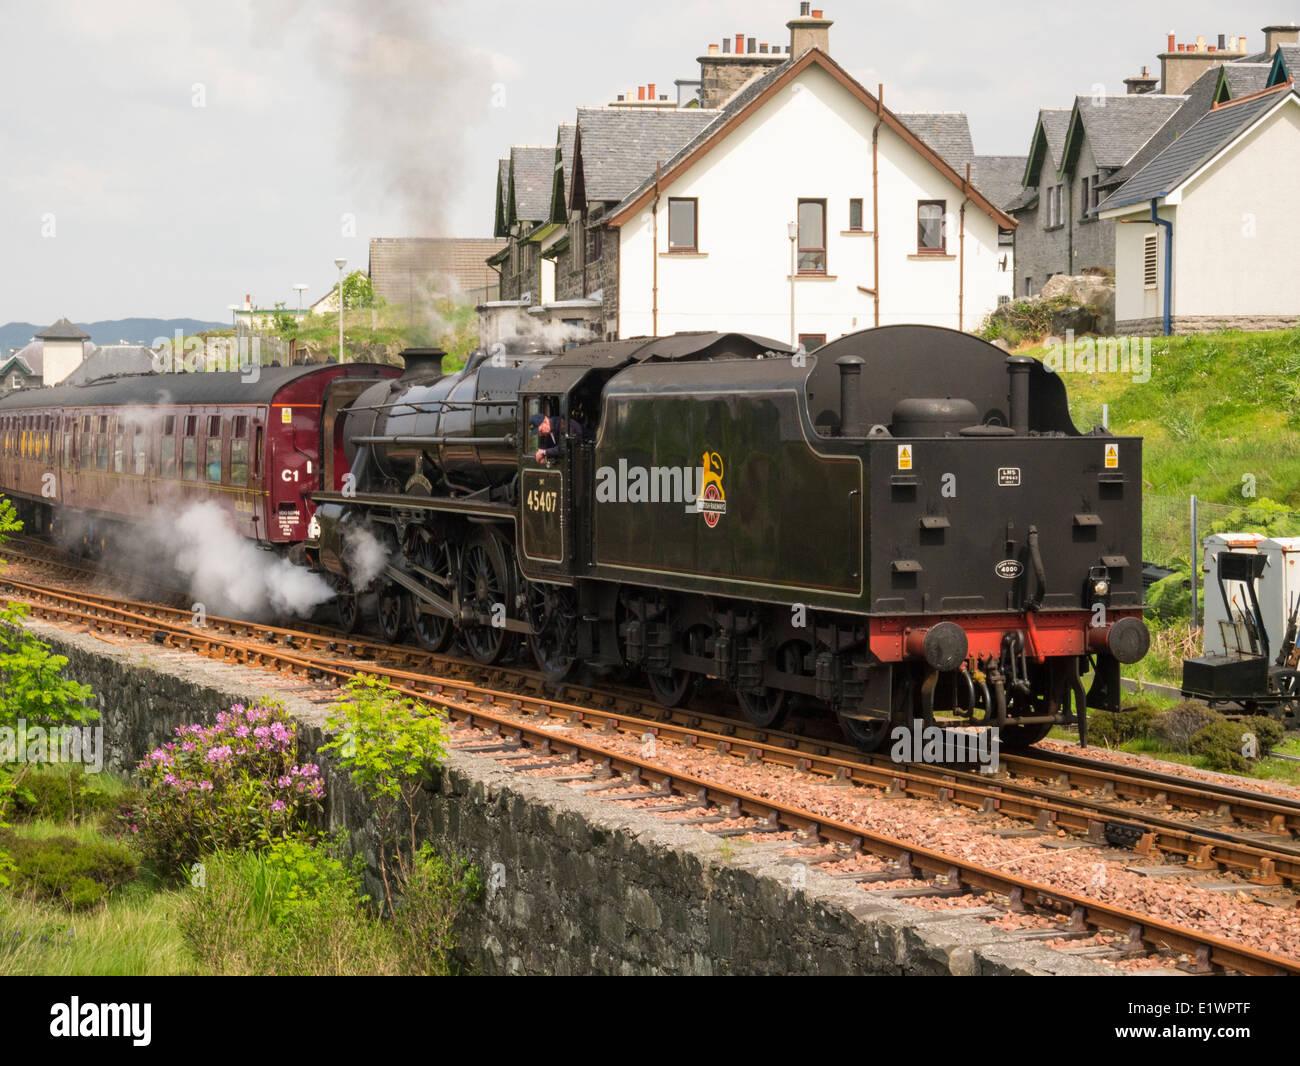 Jacobite steam train the Lancashire Fusilier leaving Mallaig village station Scottish Highlands - Stock Image